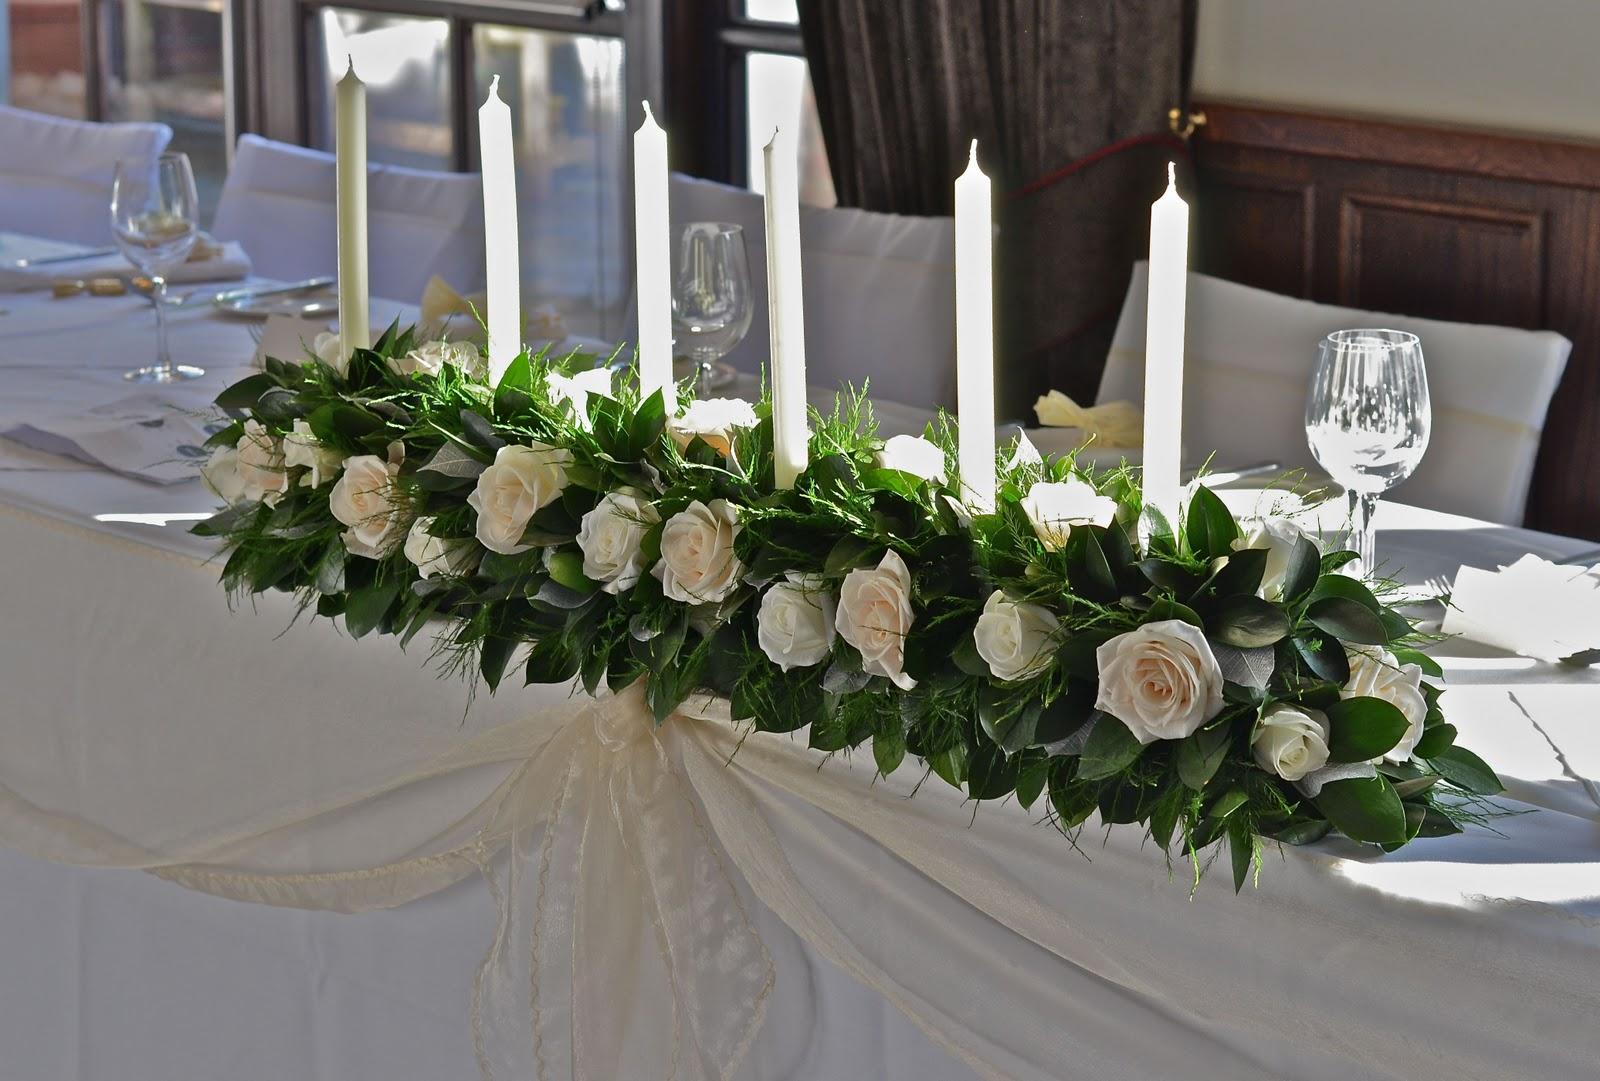 Wedding Flowers Blog: Amy's Christmas Wedding Flowers, New